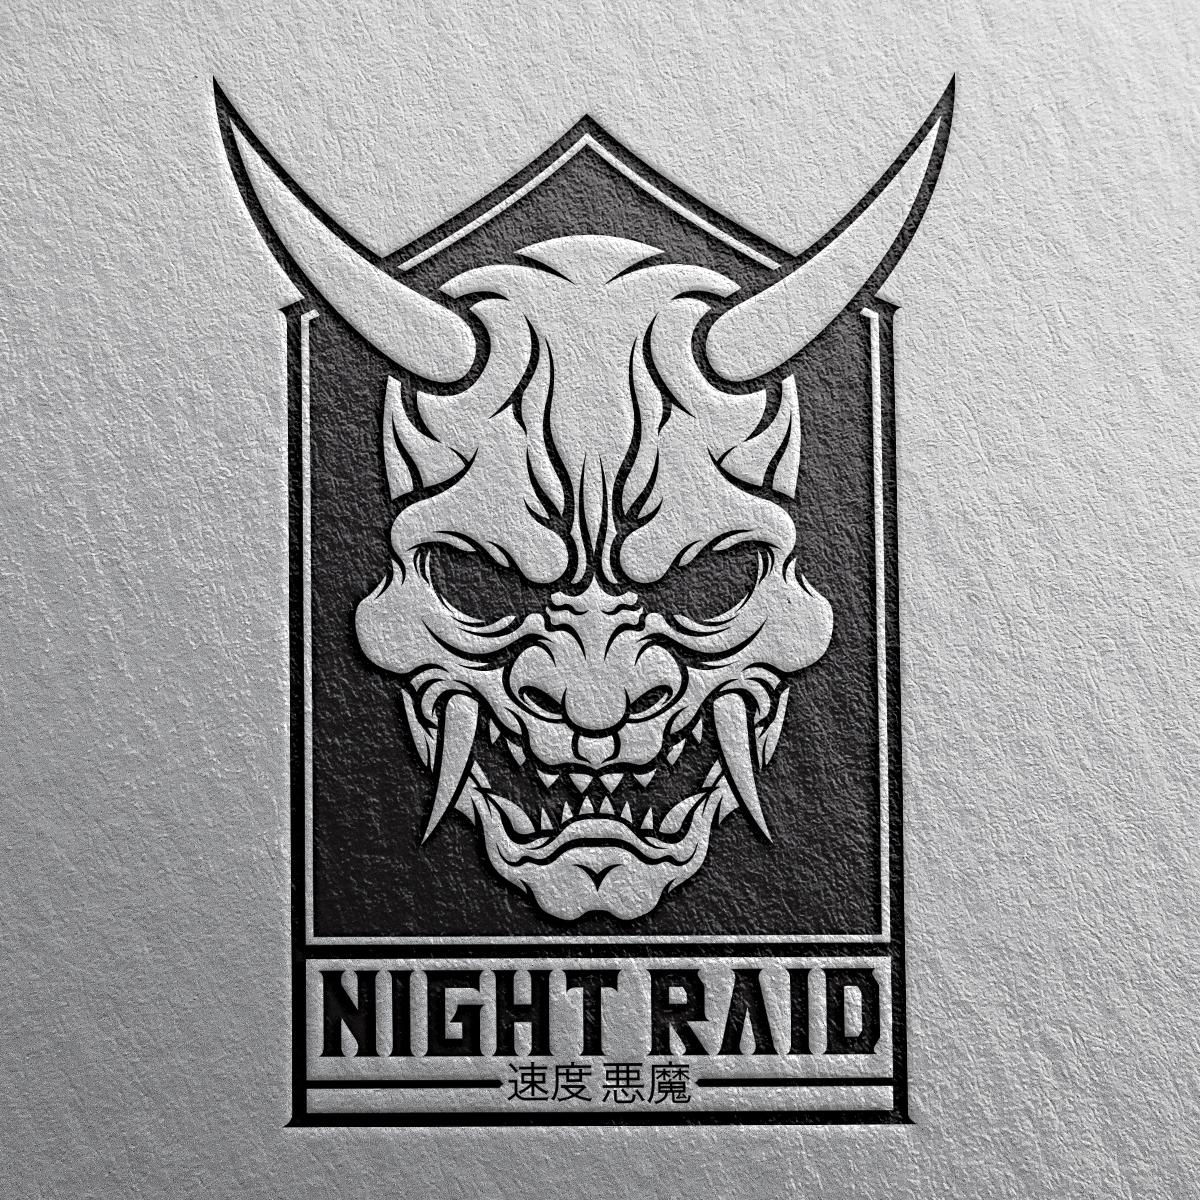 nightraid-orozcodesign-onimask-logo-letterpress-1.jpg